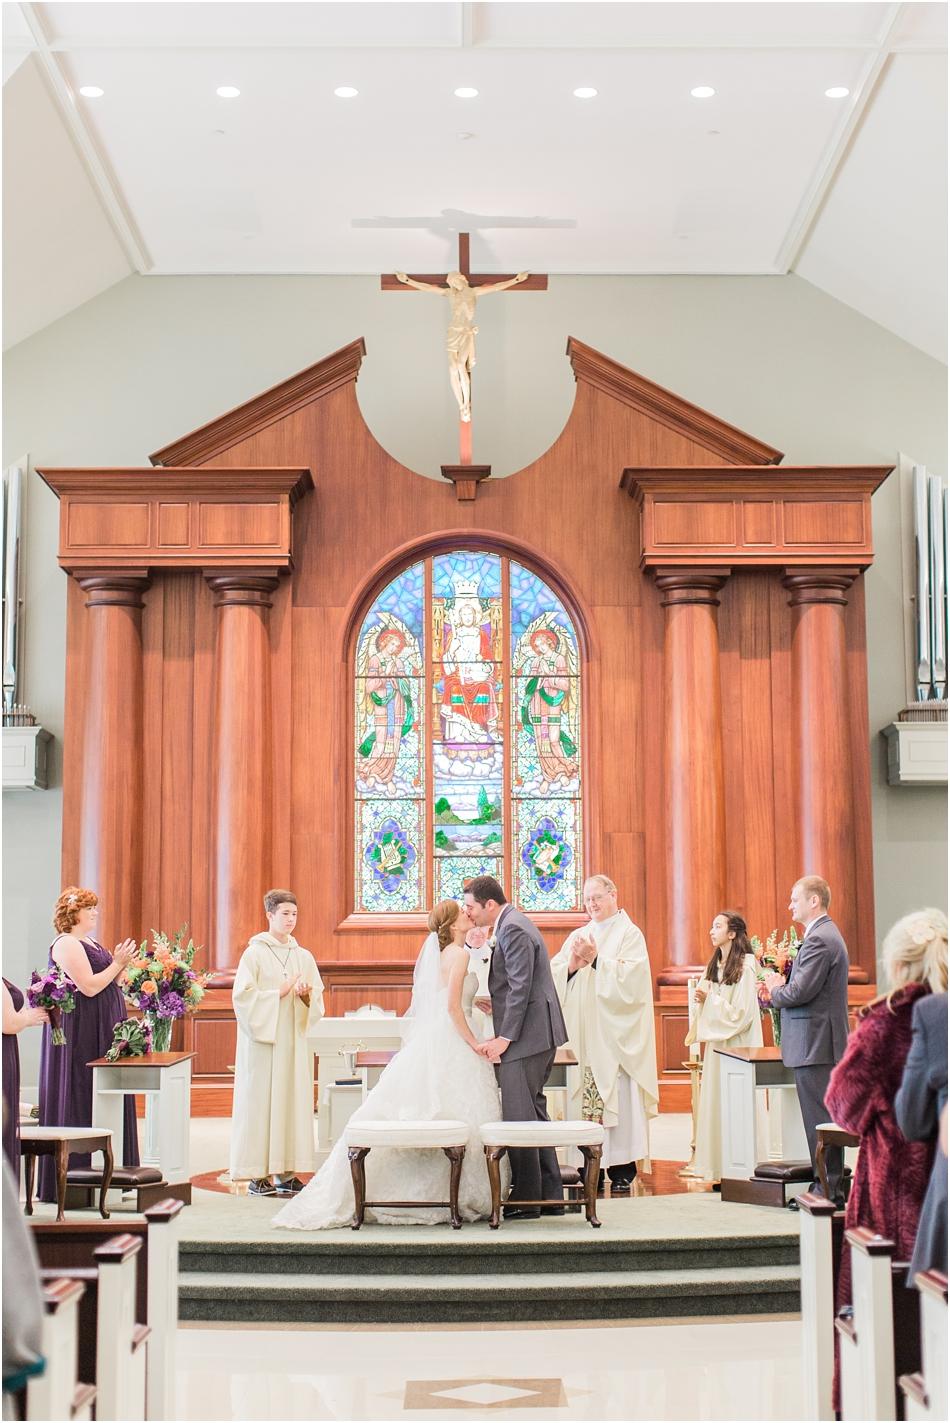 willowbend_megan_david_country_club_cape_cod_boston_new_england_wedding_photographer_Meredith_Jane_Photography_photo_0188.jpg